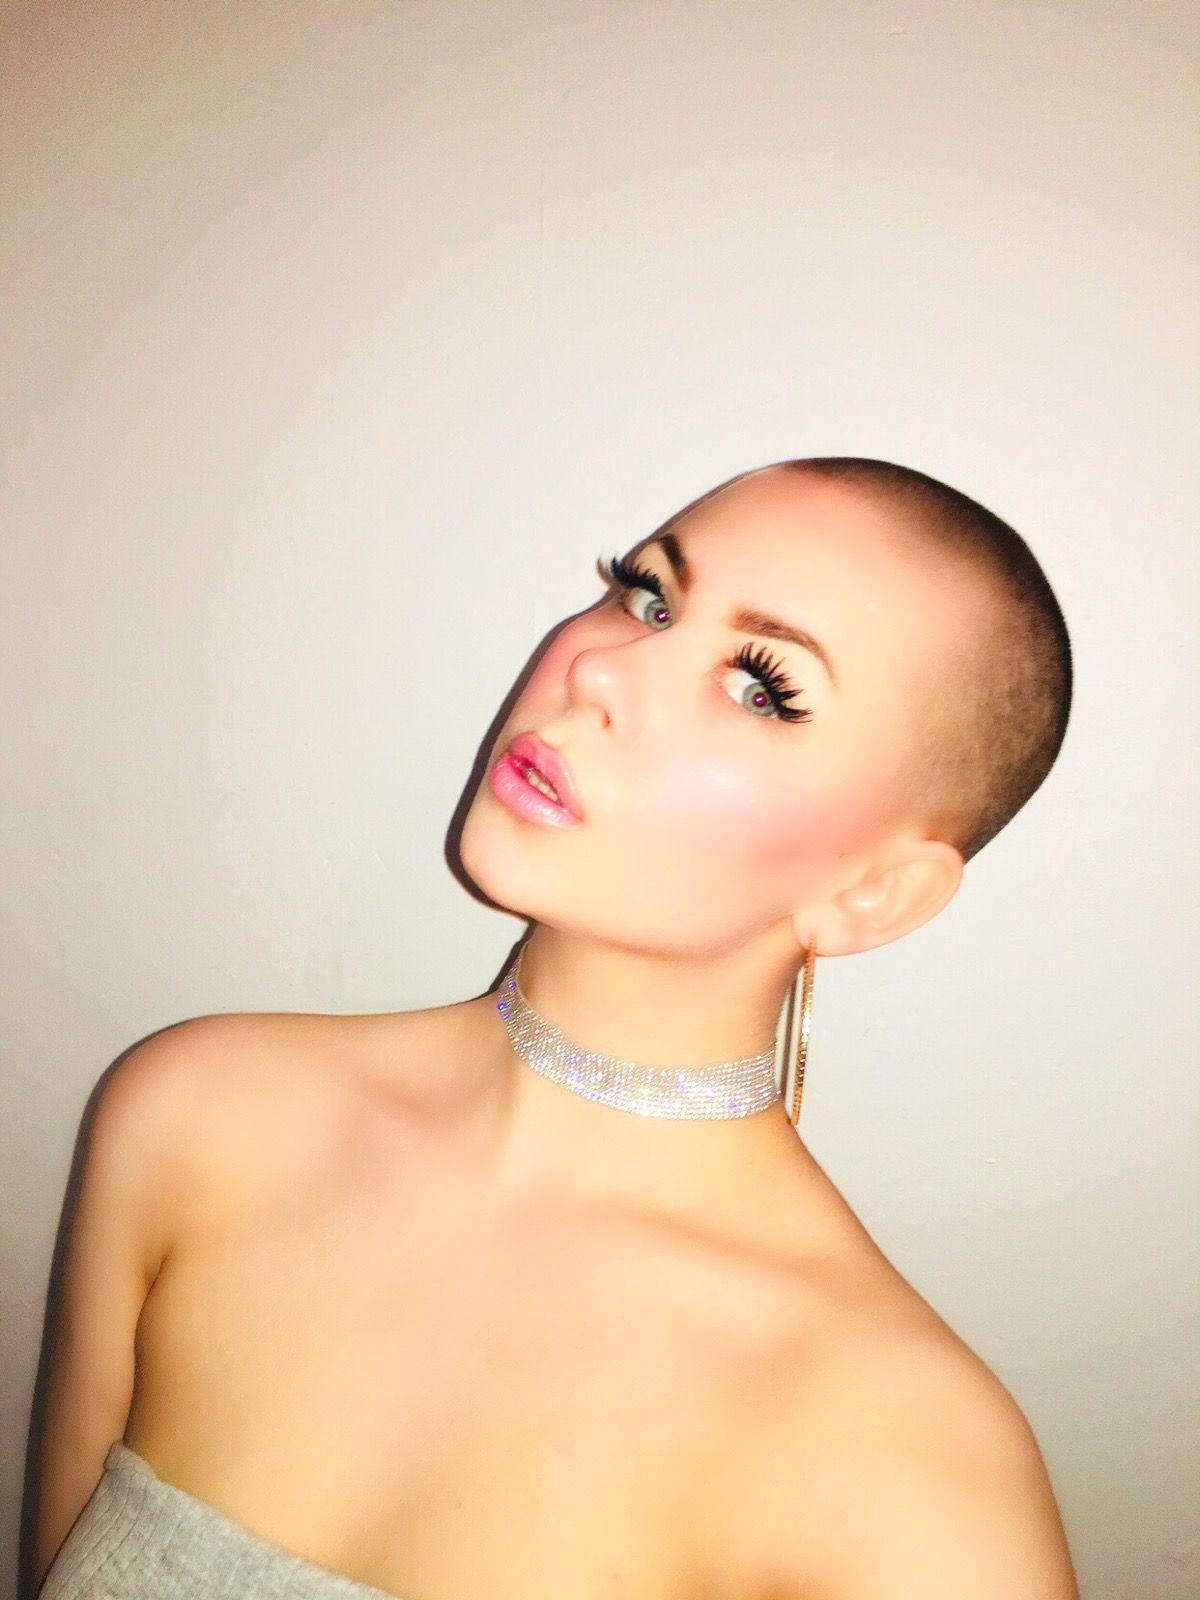 The bald barbie nanna baldwomen buzzcut hairdare tapered